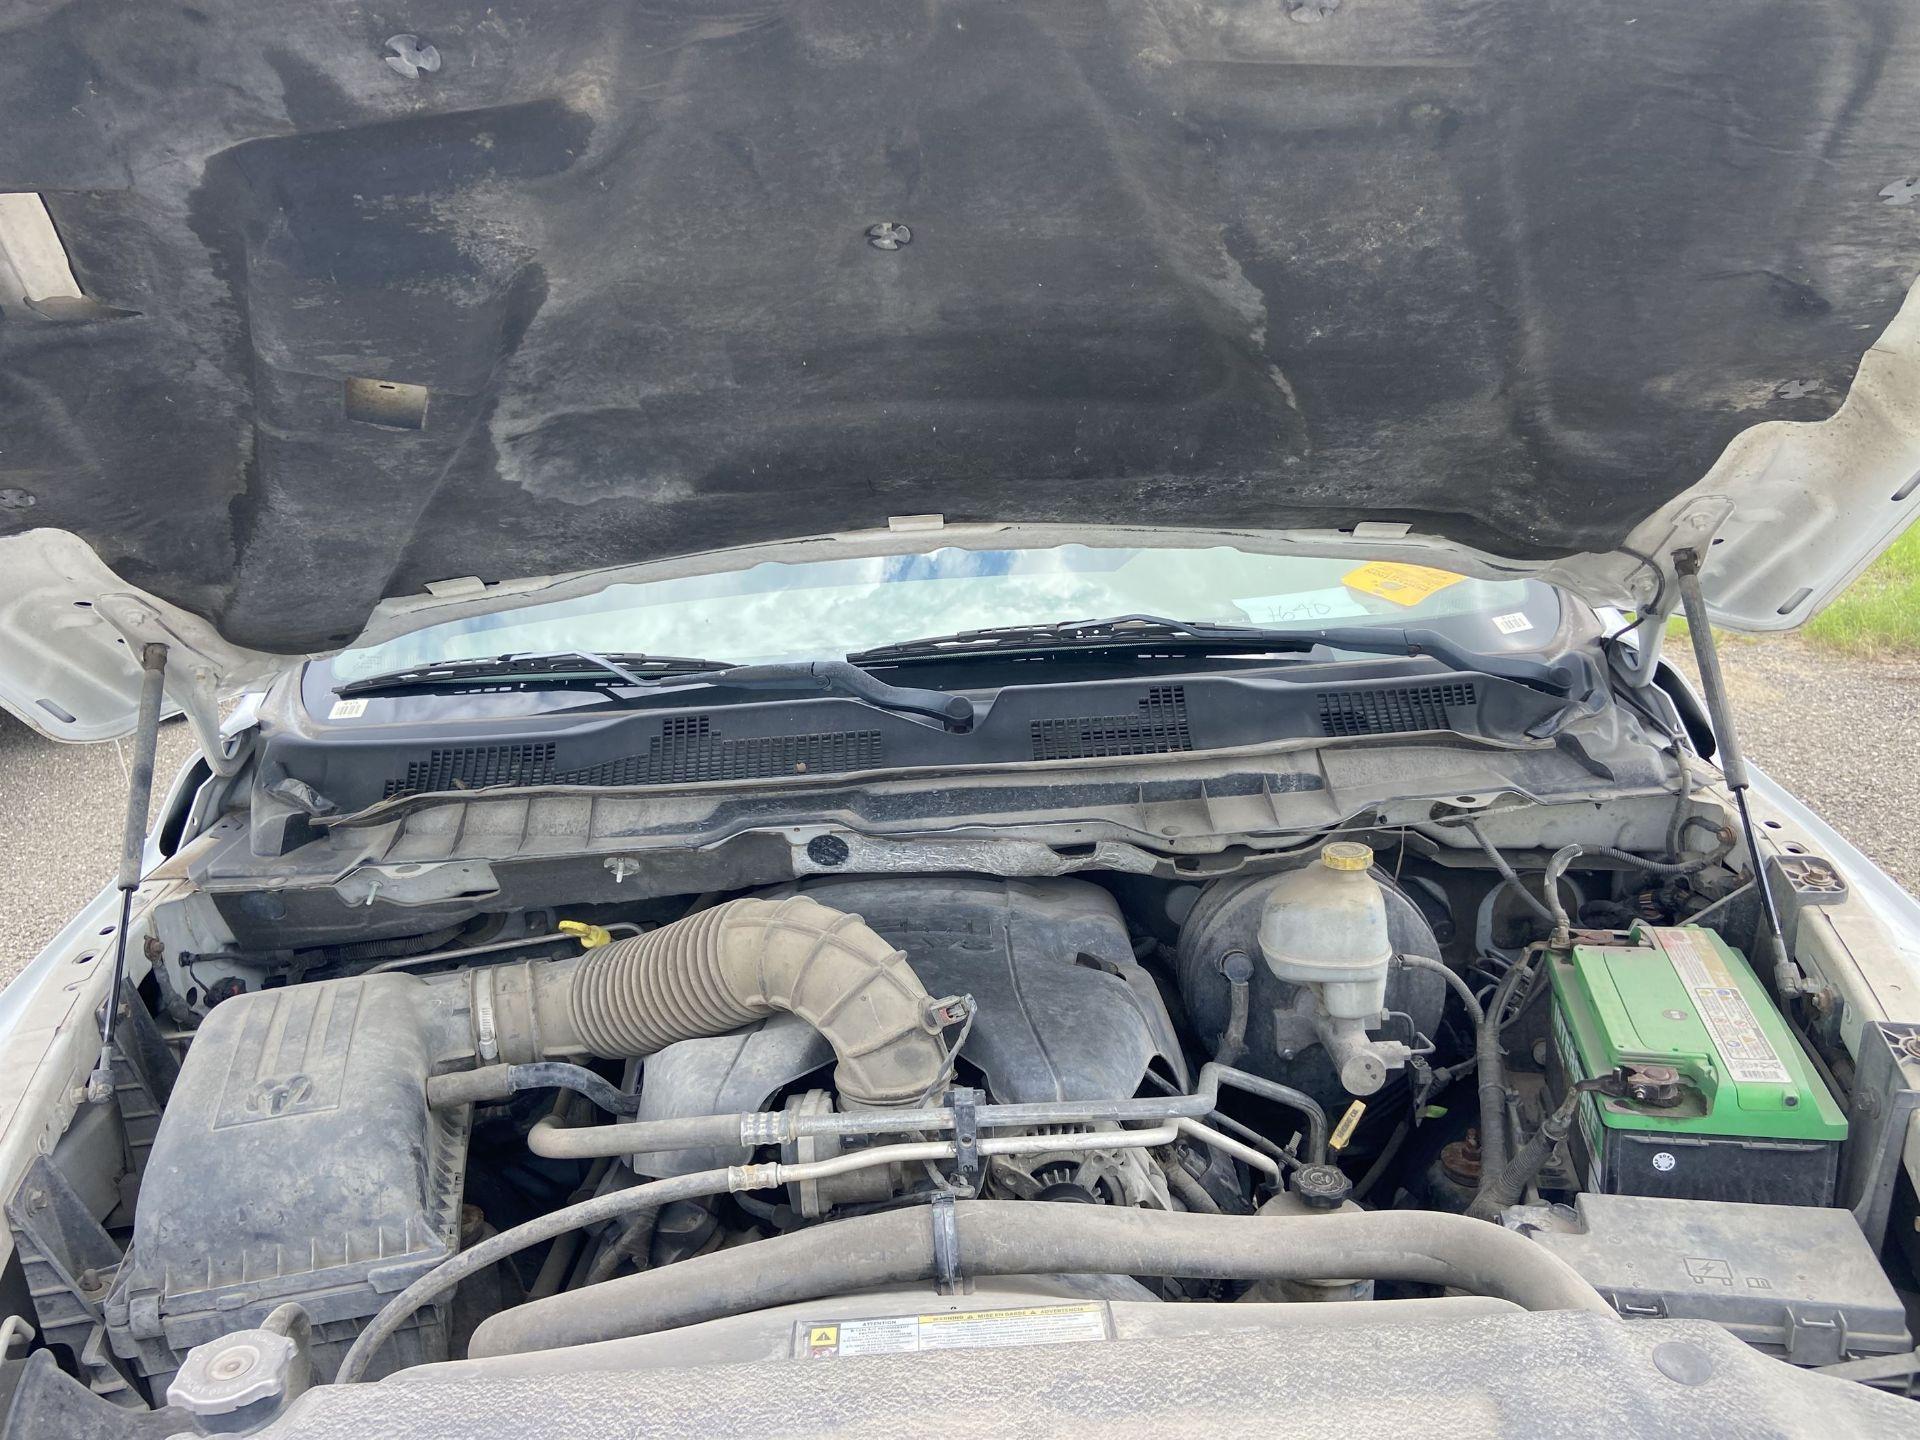 2011 Dodge Ram 2500 HD Crew Cab Long Bed, 212k Miles, Vinyl, 4x4, Gas, VIN # 3D7TT2CT9BG626009 - Image 16 of 16